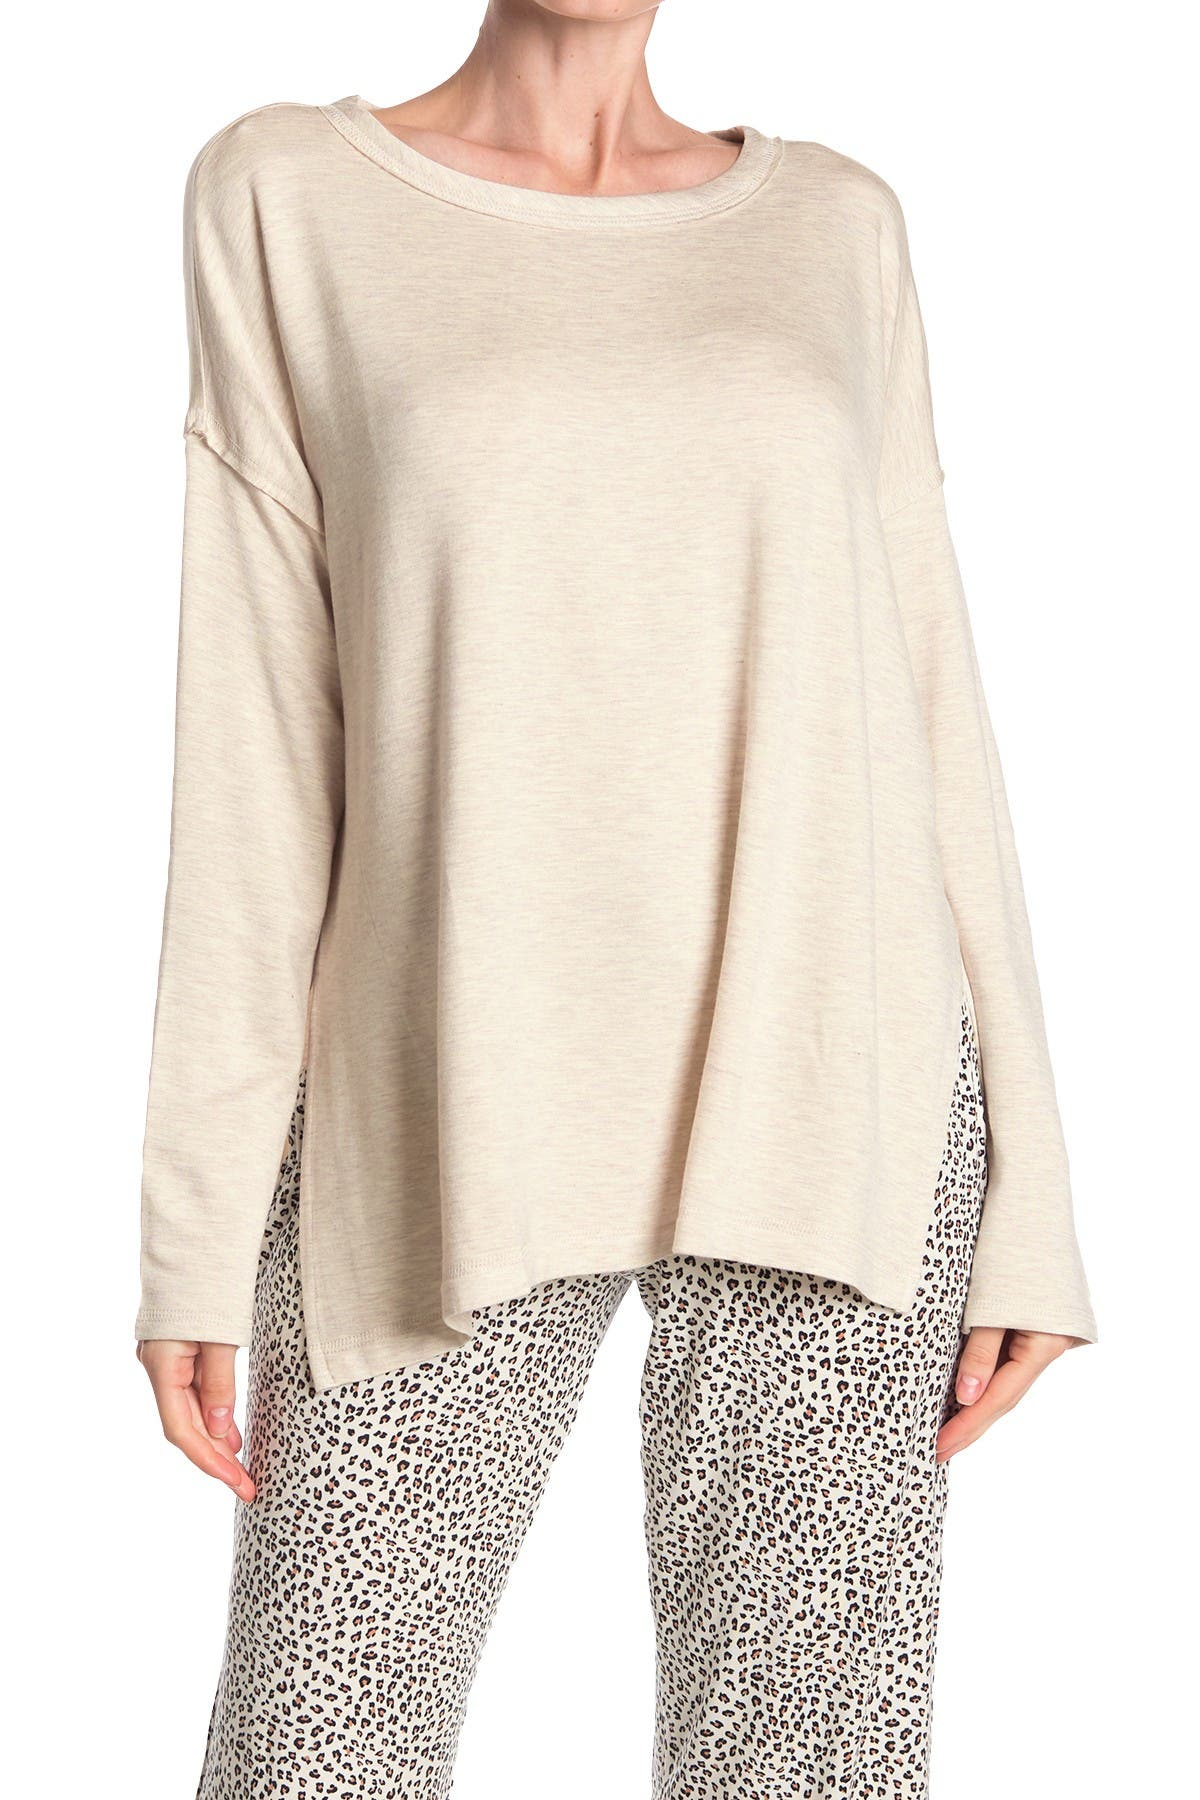 Image of Donna Karan Long Sleeve Pajama T-Shirt